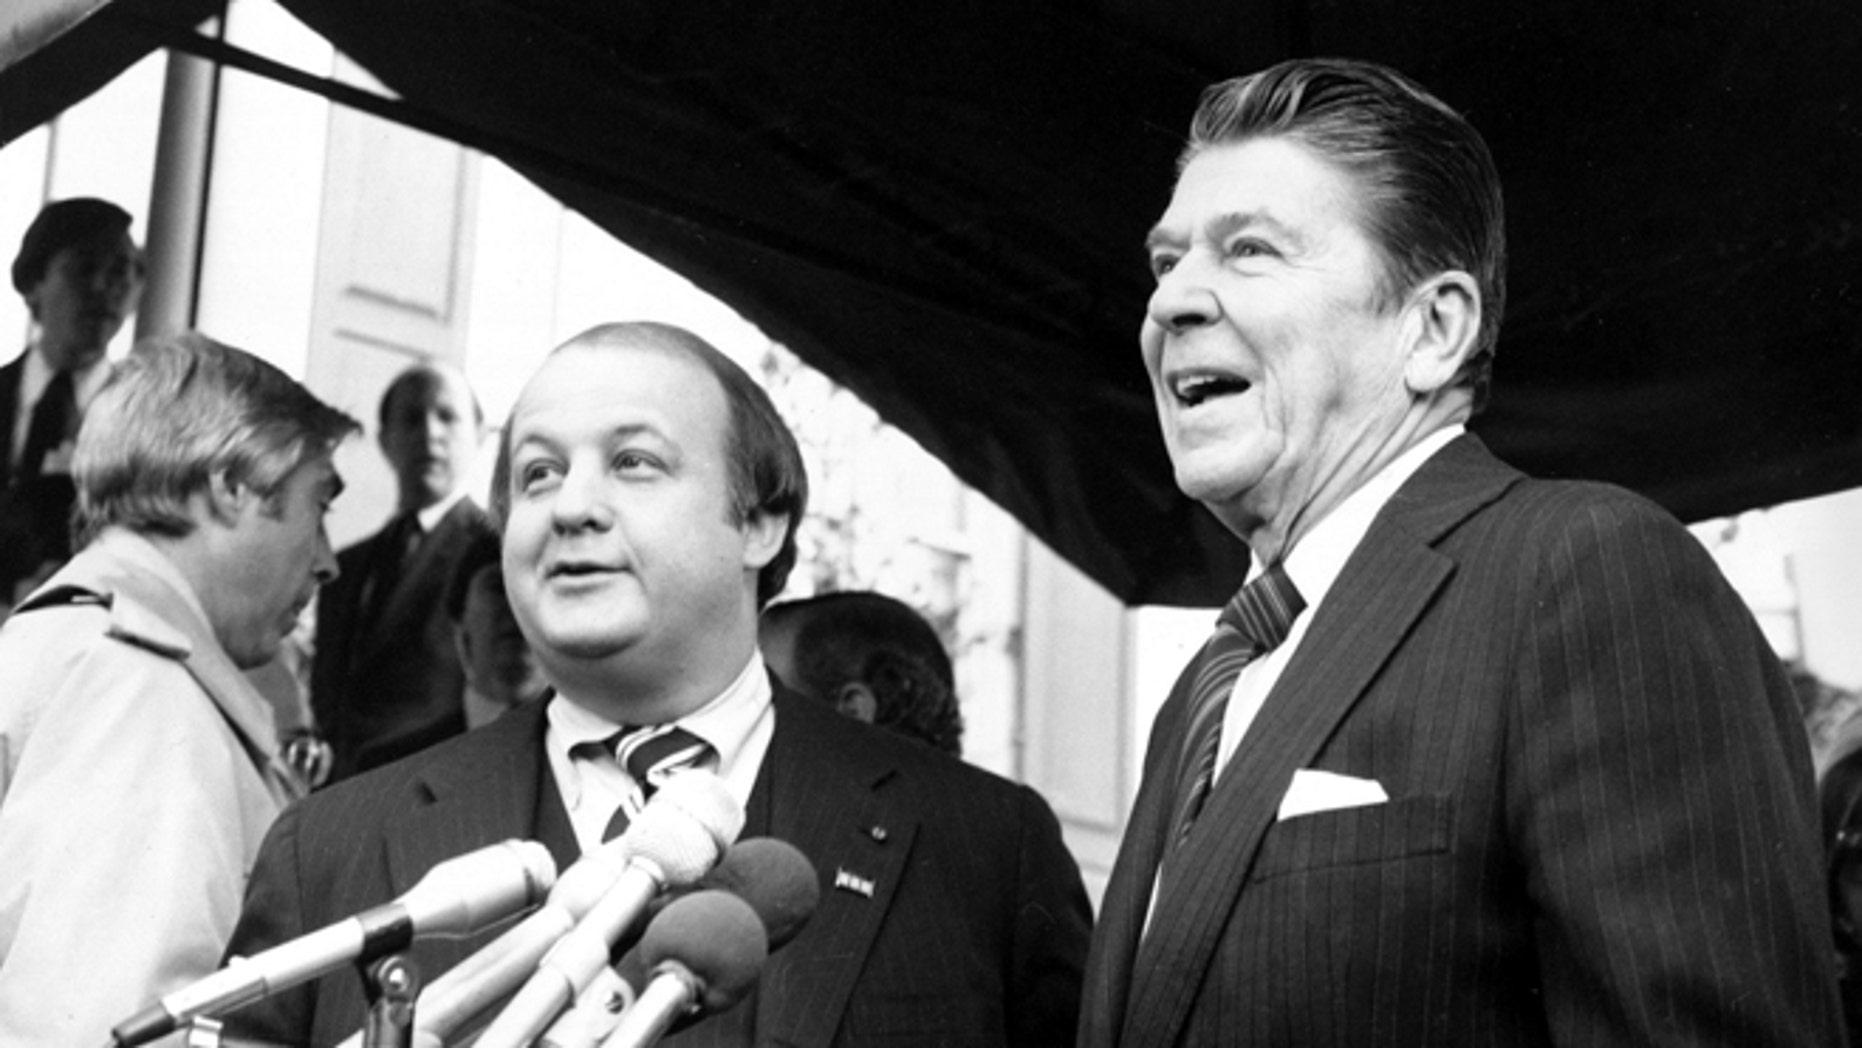 Jan. 6, 1981: President-elect Ronald Reagan introduces James Brady as his press secretary in Washington.